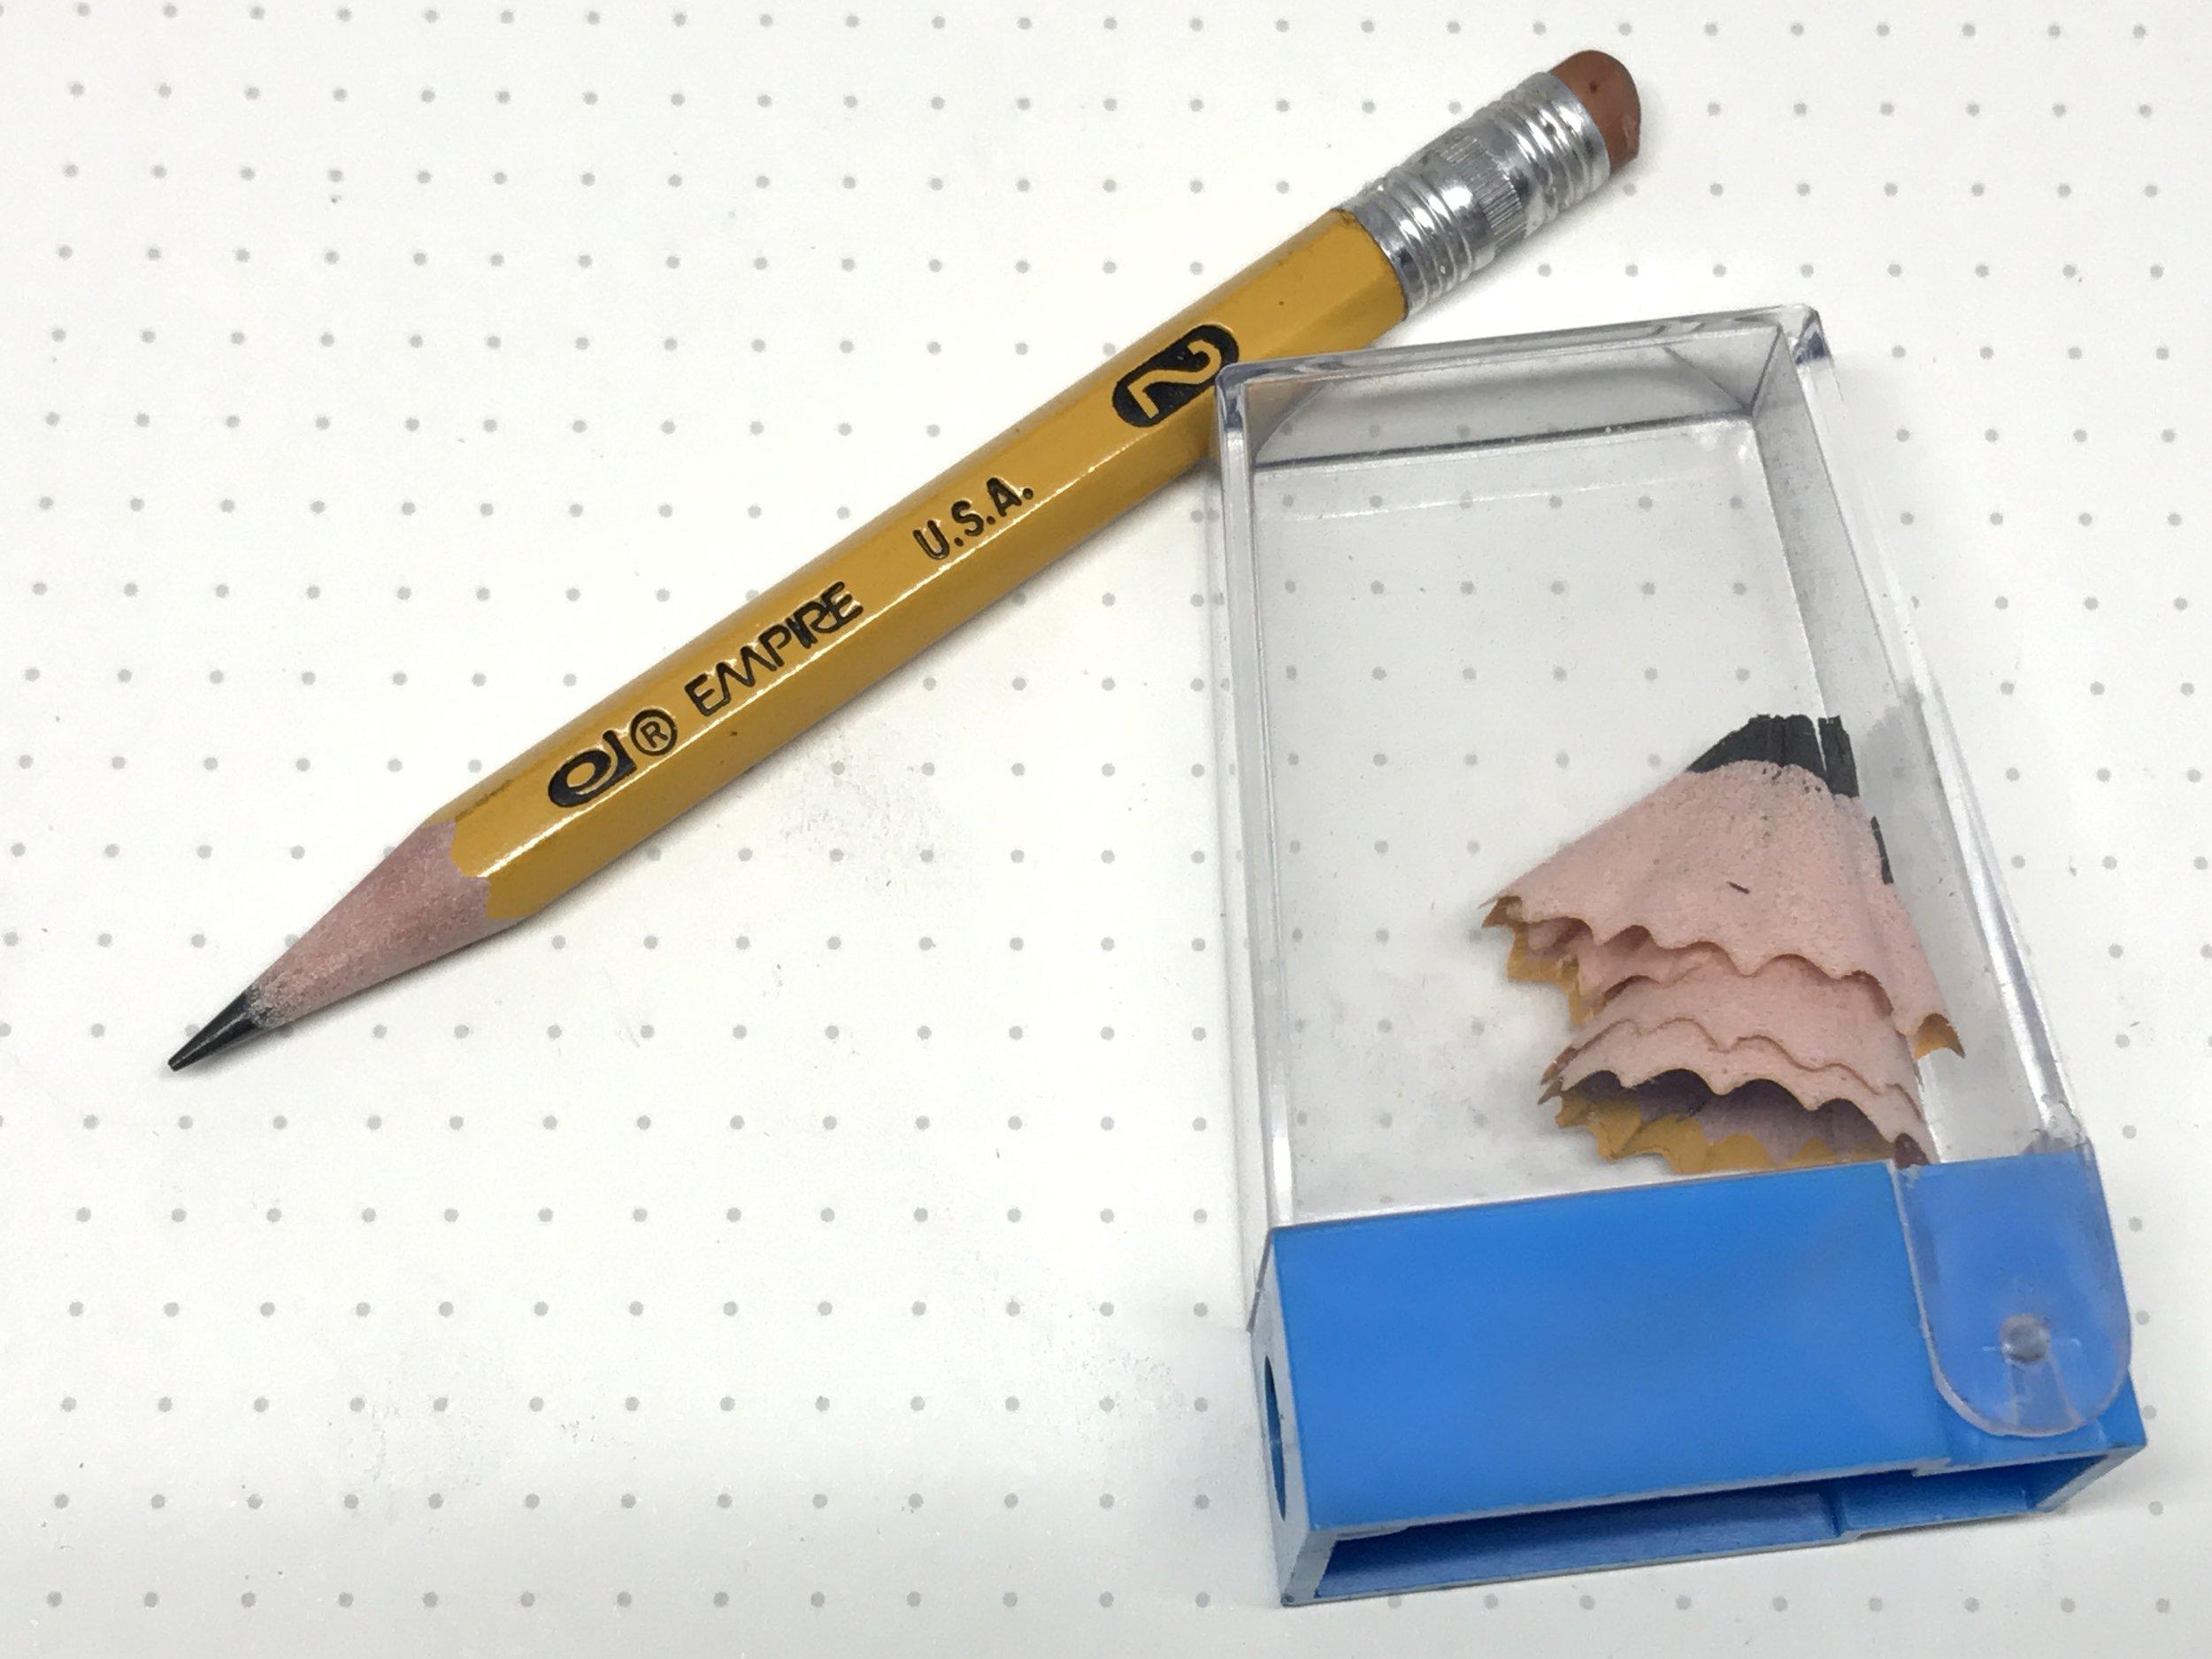 Empire Pencil and Pedigree Sharpener - my grade school tools.